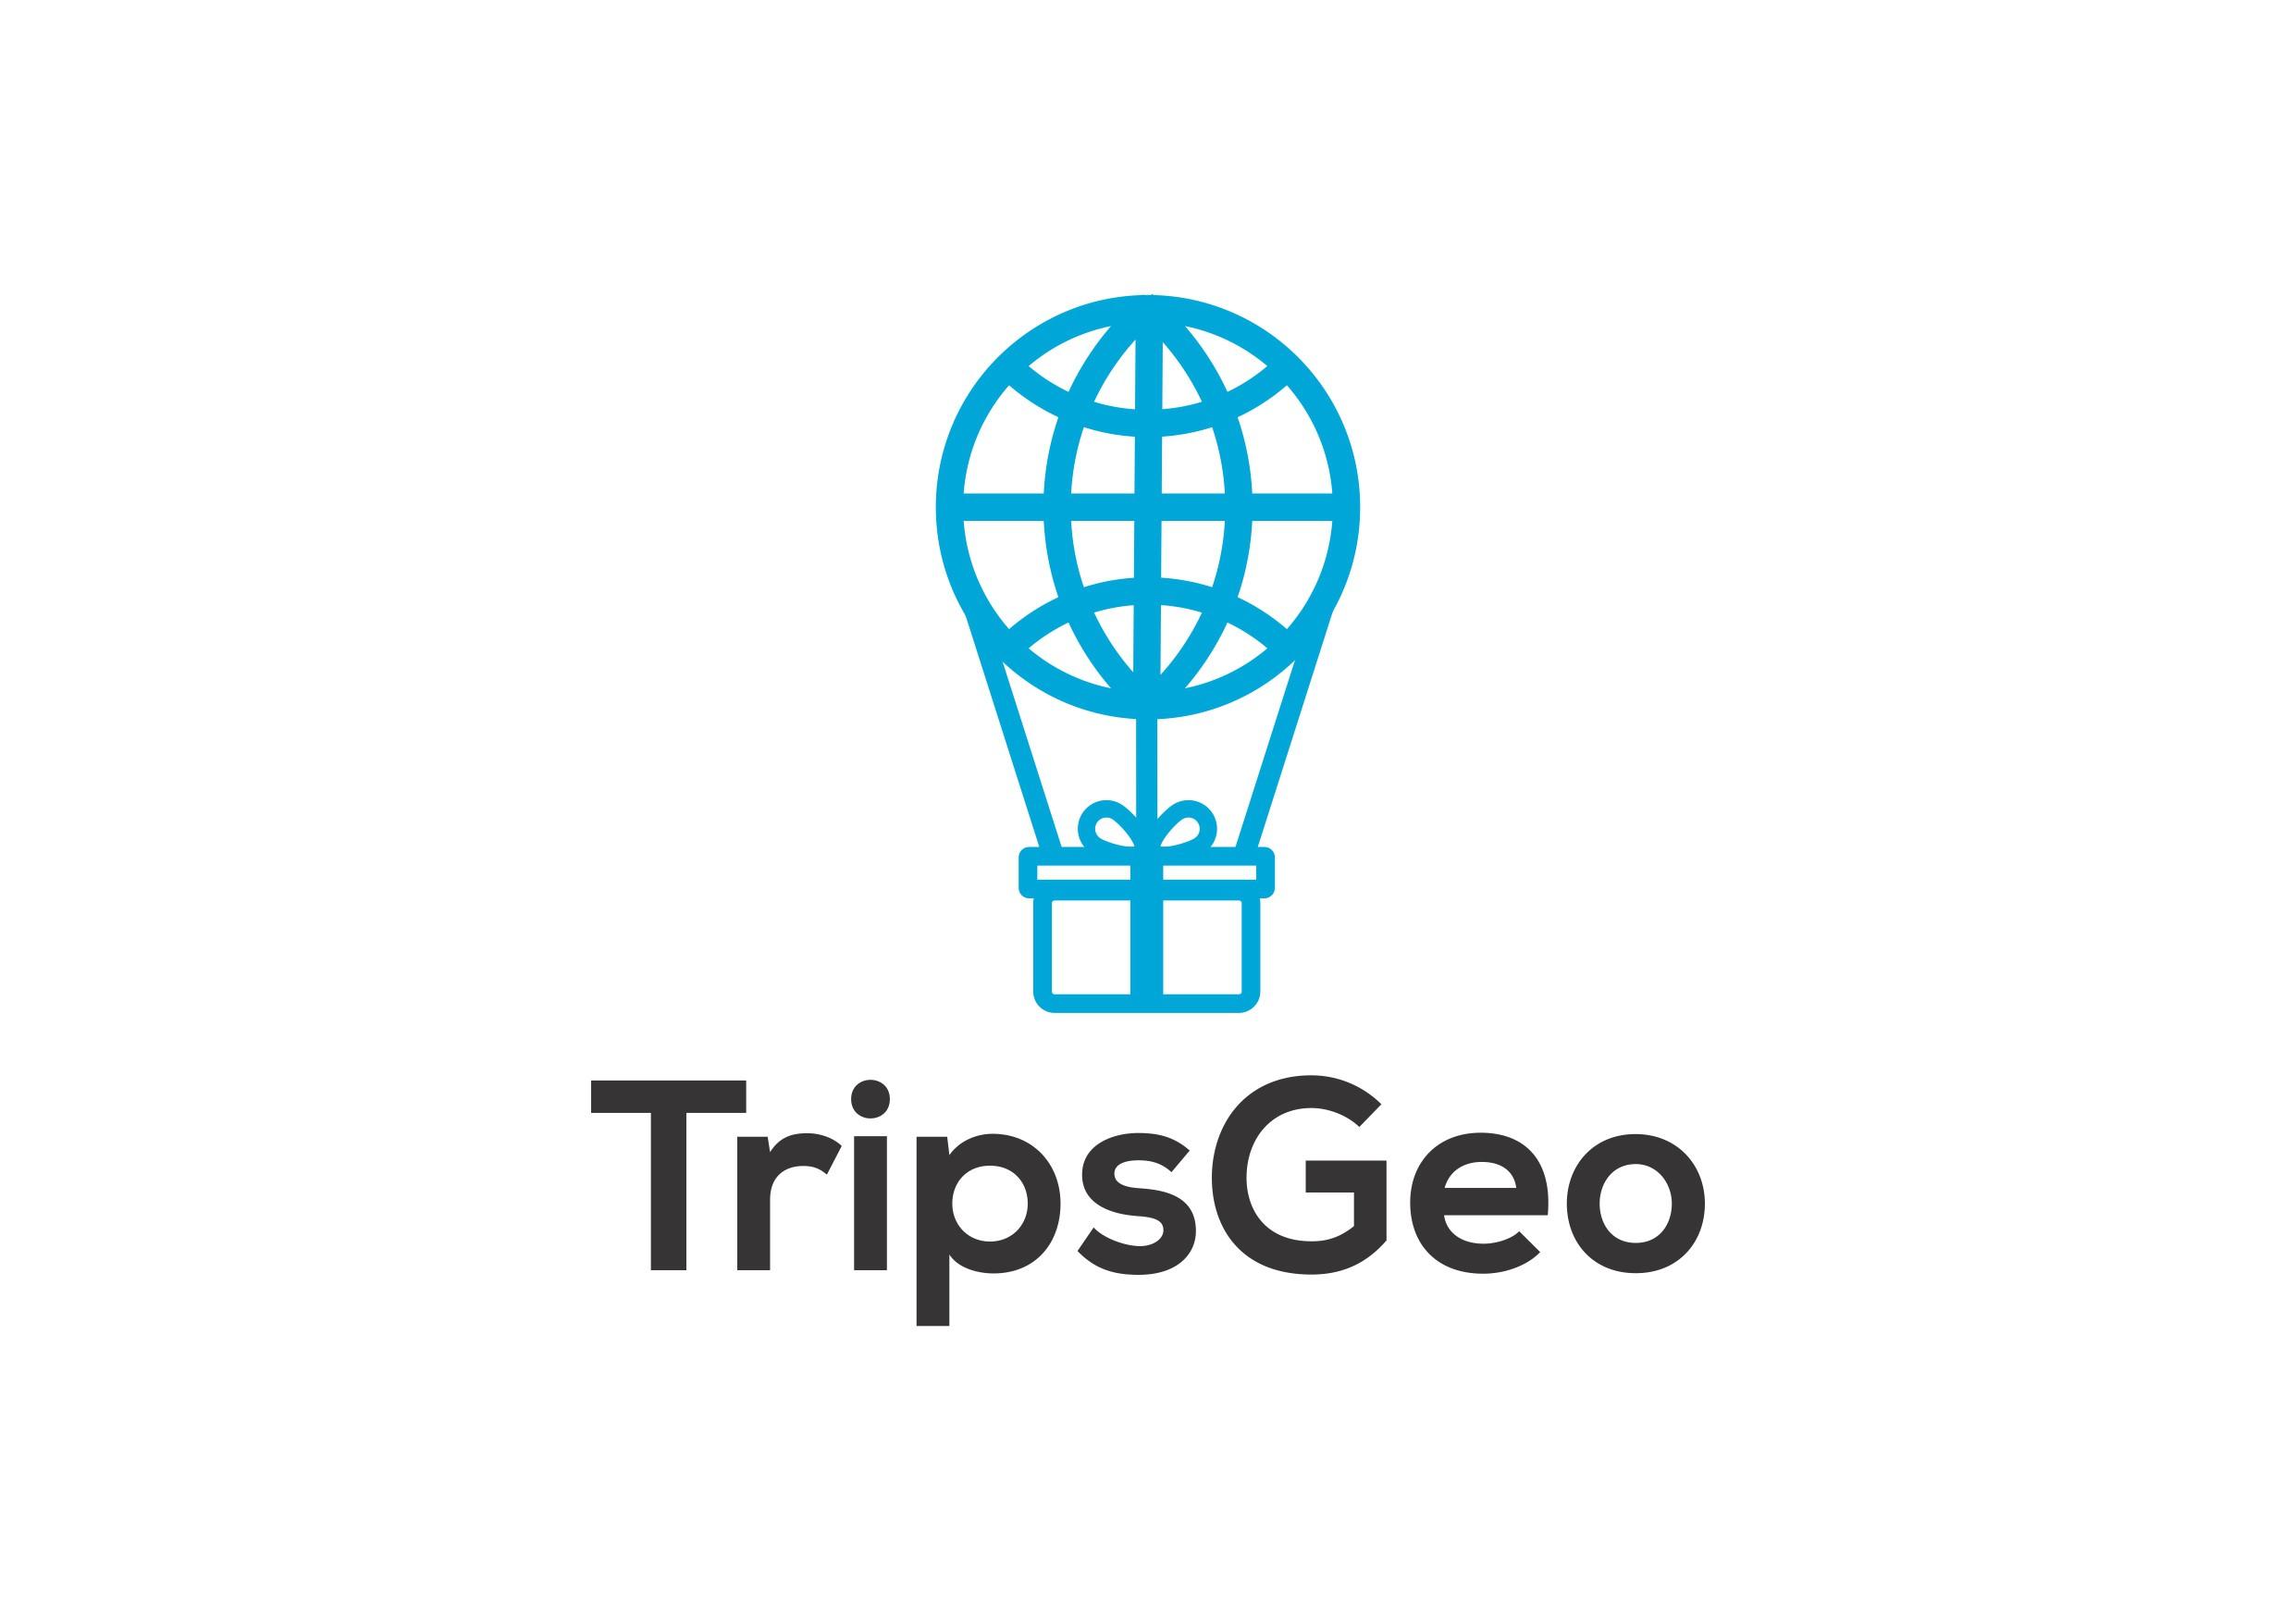 TripsGeo Log design